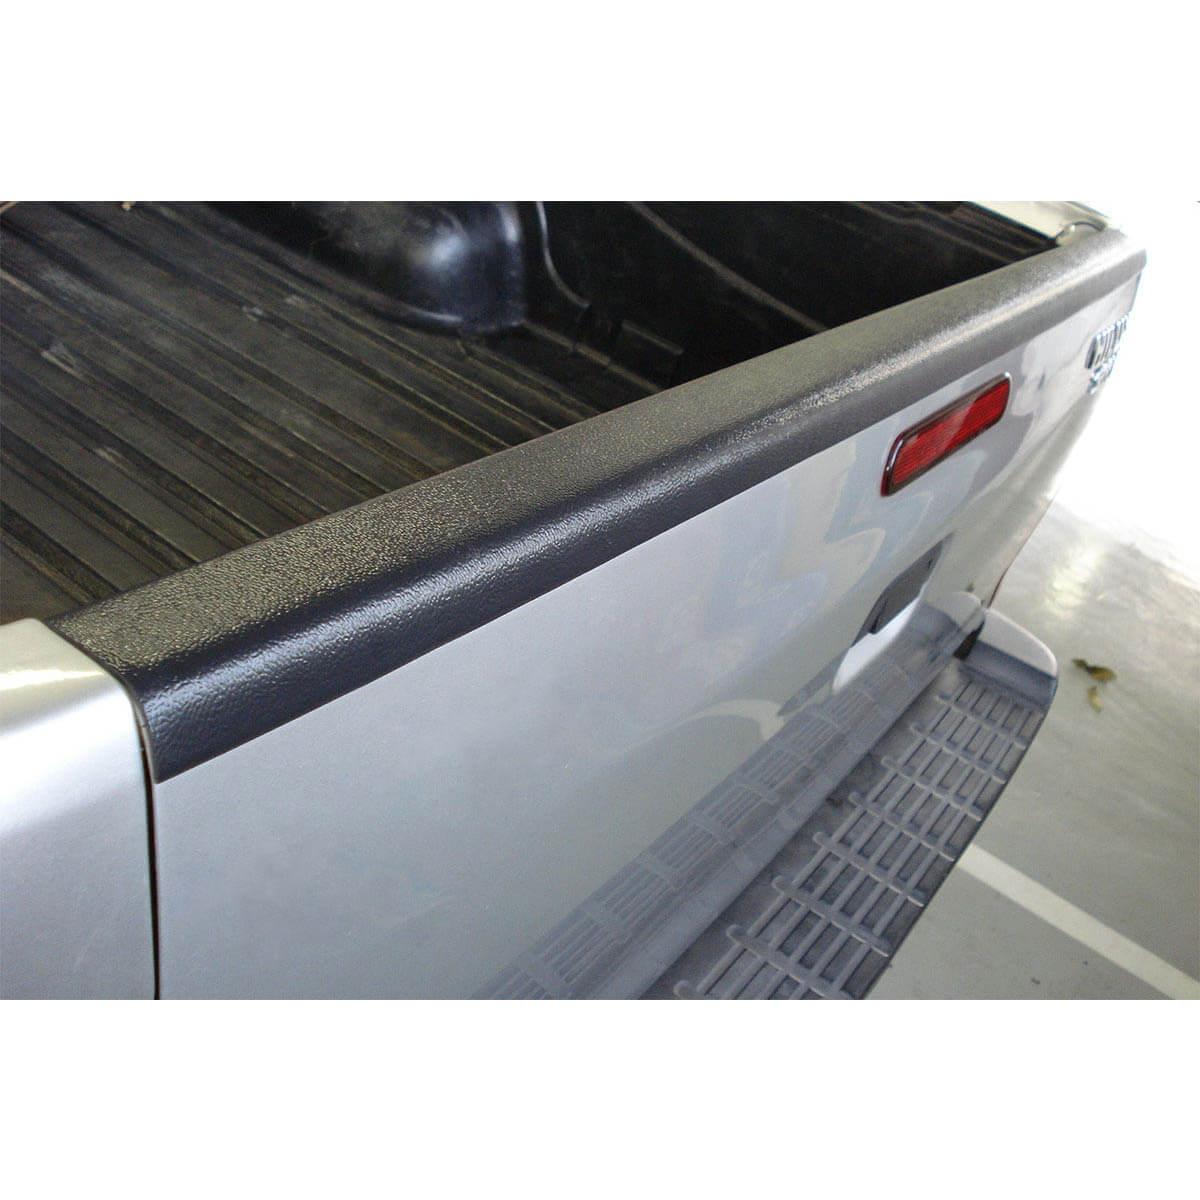 Protetor borda tampa caçamba L200 Triton 2008 a 2016 HPE HLS Outdoor AT Diesel Outdoor FLEX